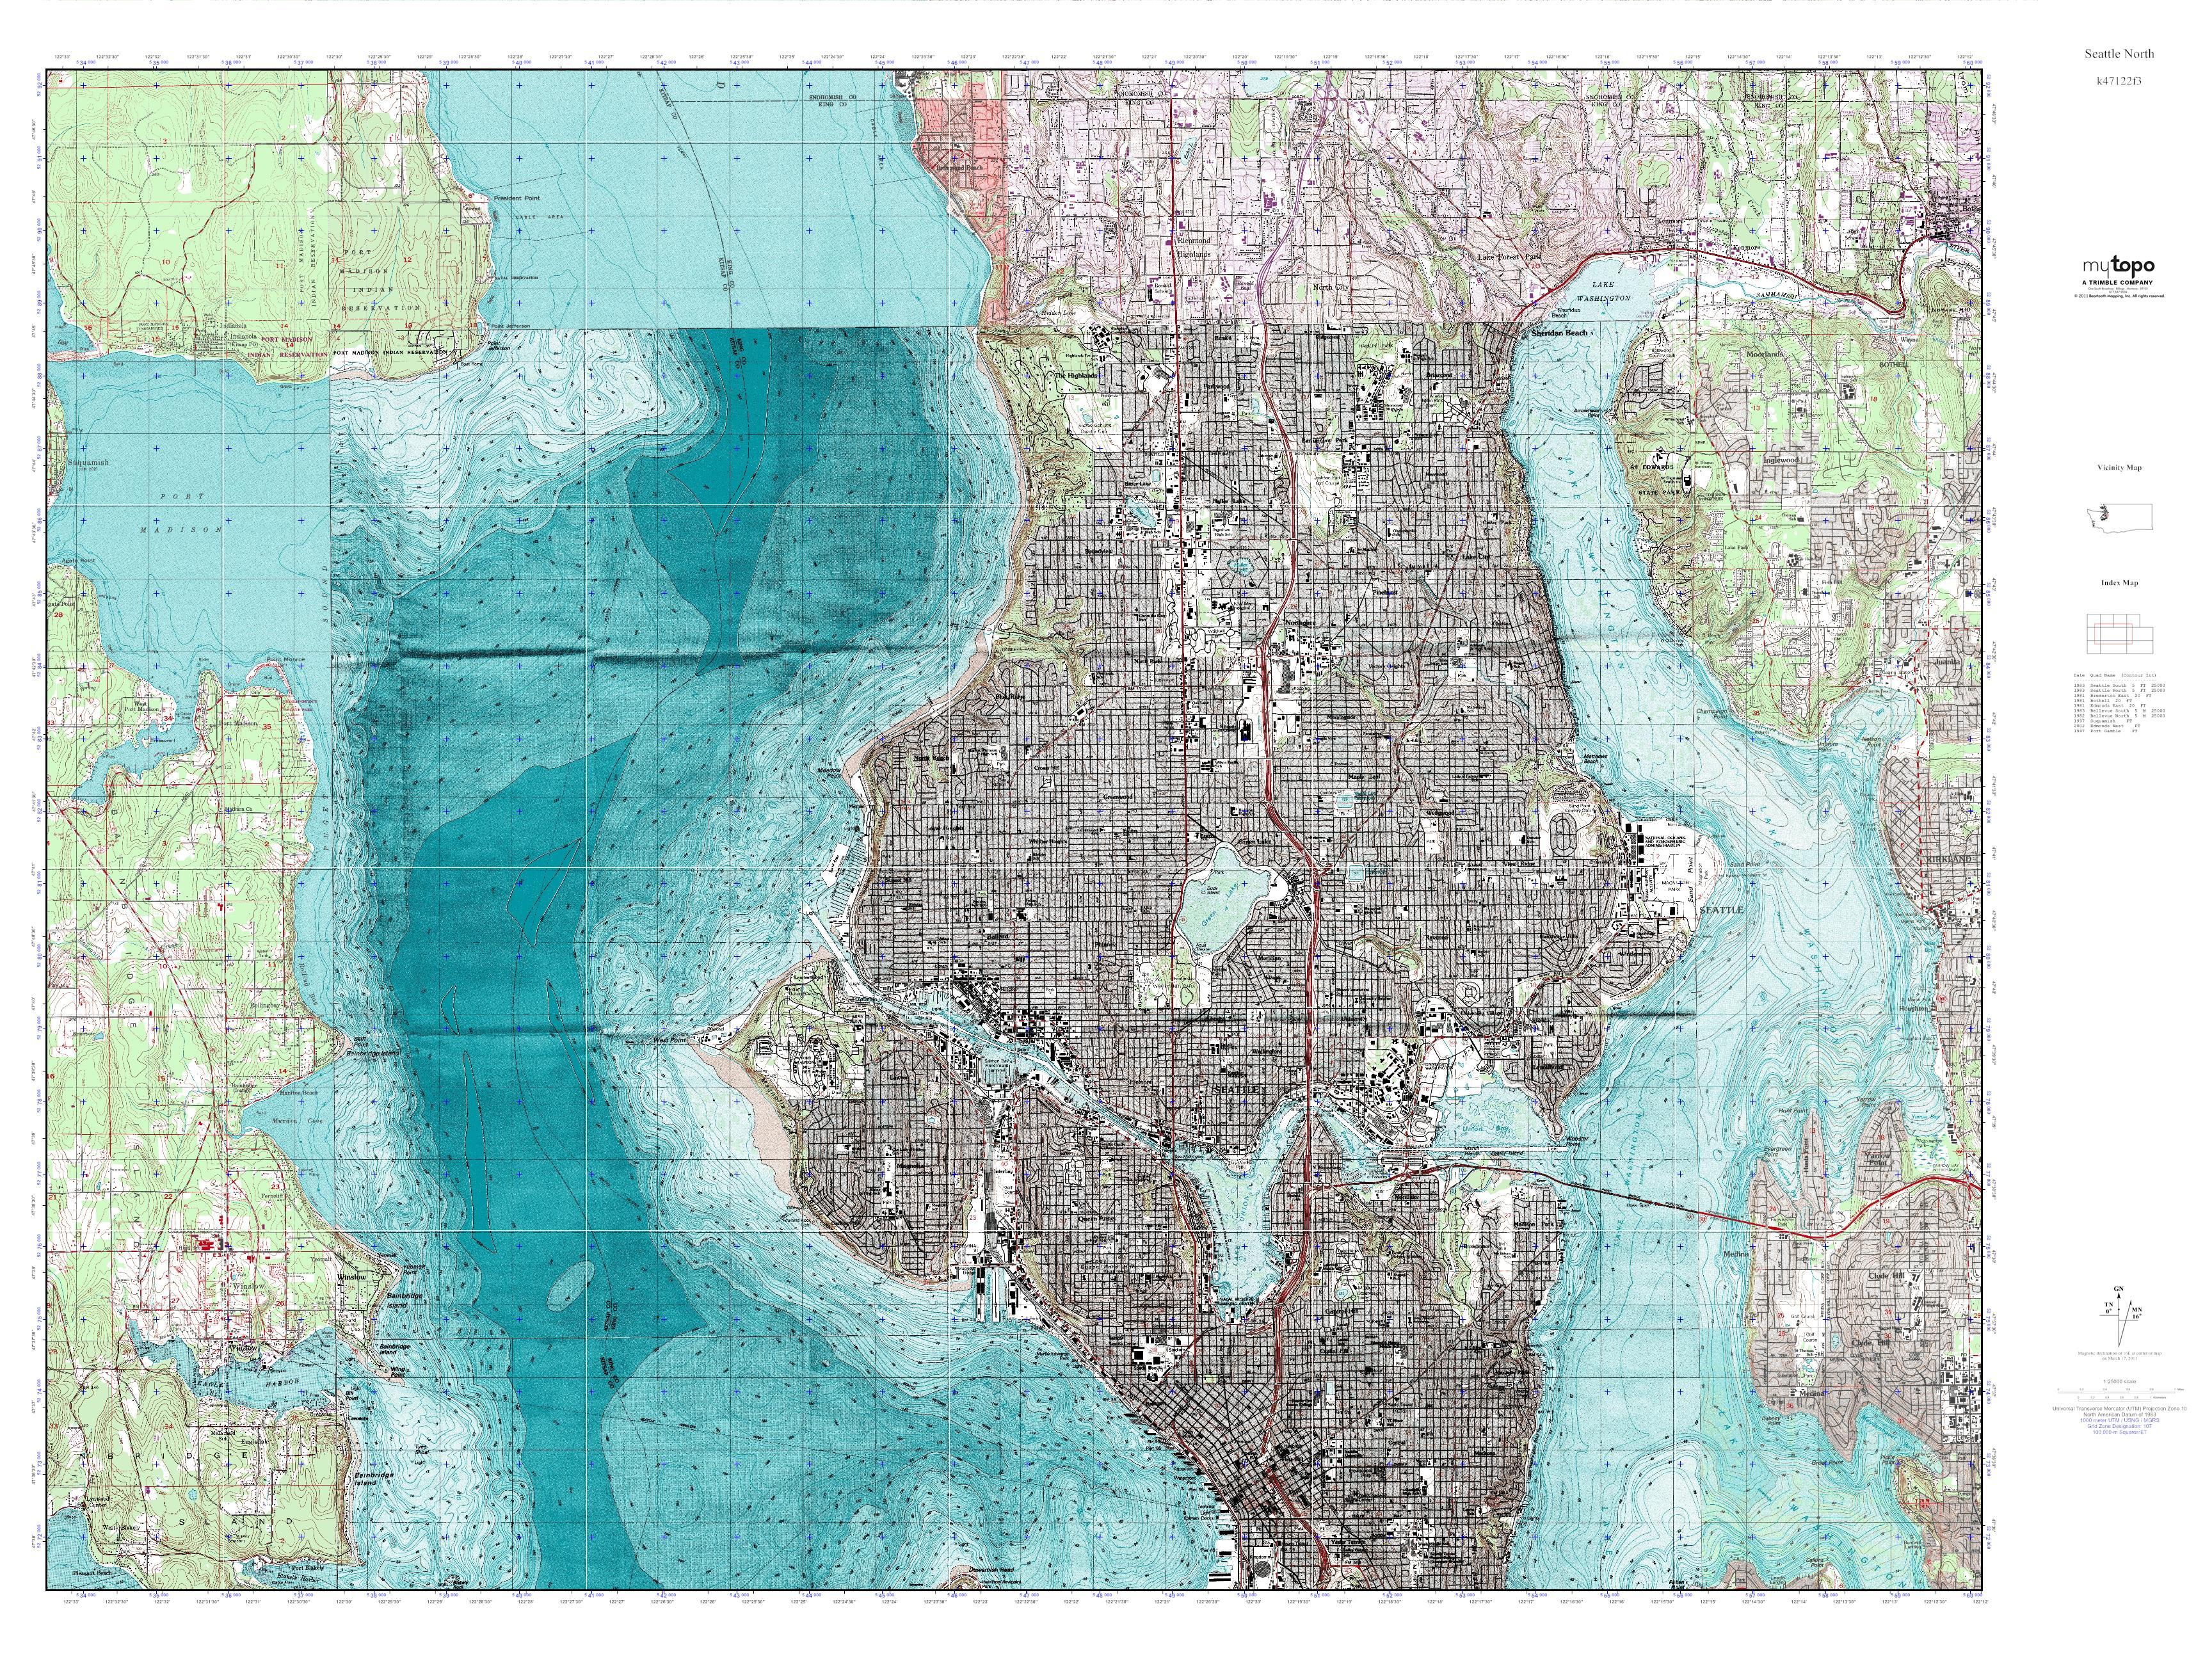 MyTopo Seattle North Washington USGS Quad Topo Map